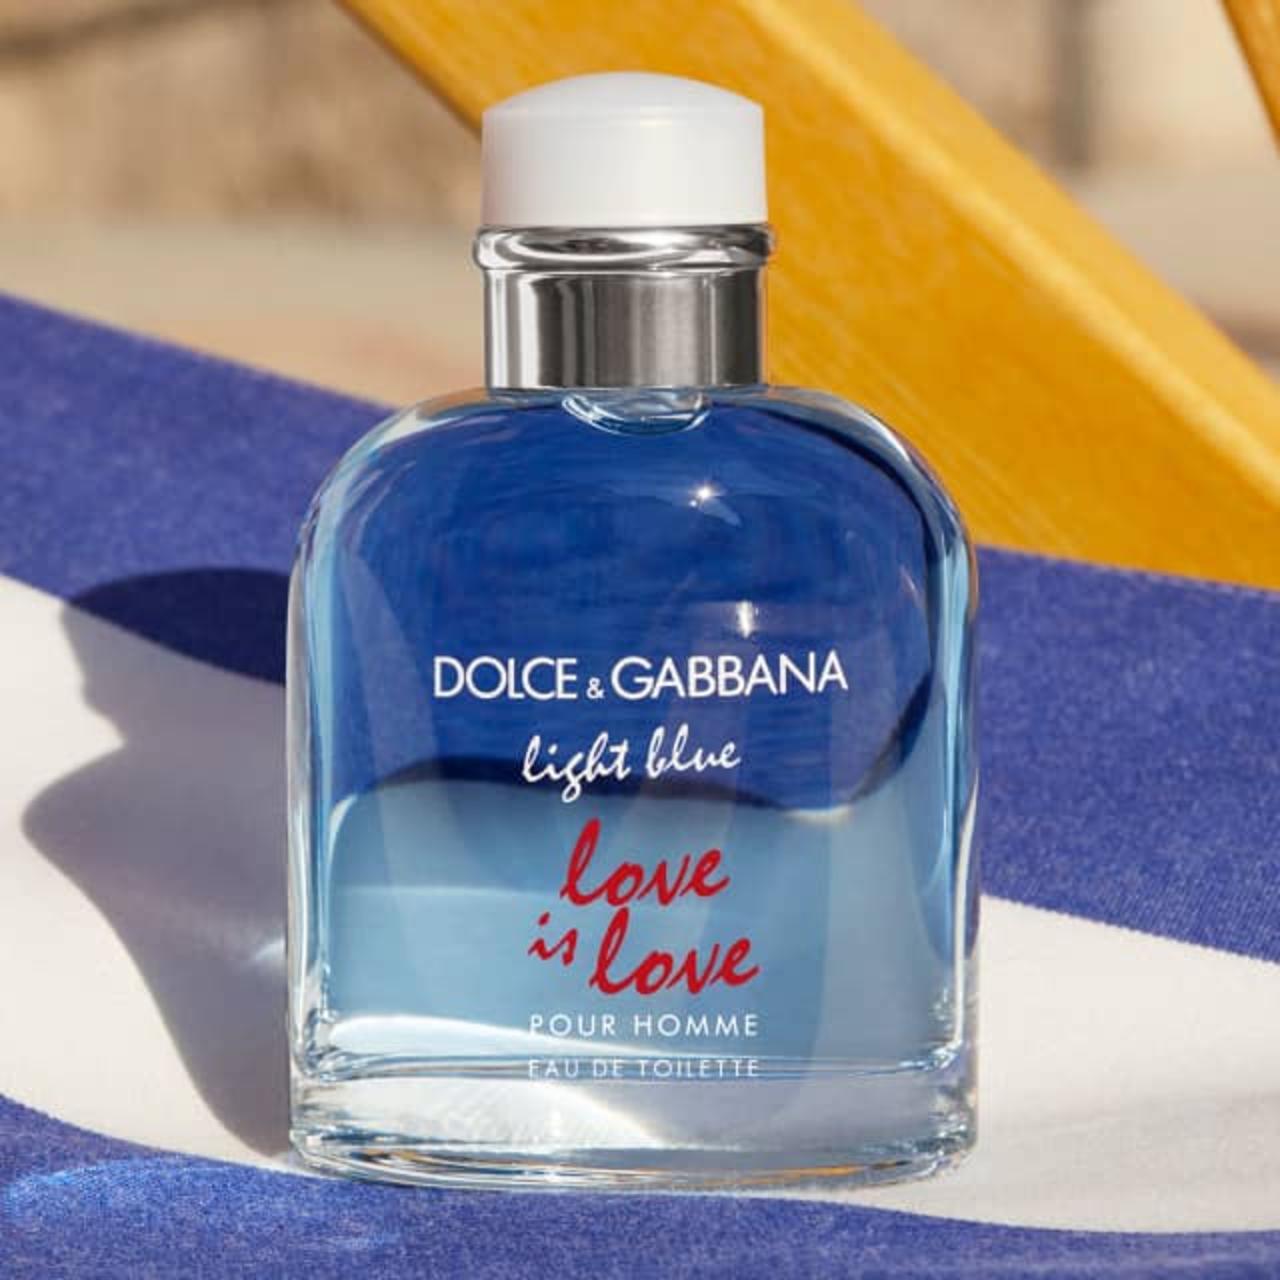 Dolce & Gabbana Light Blue Love is Love, 11.899 kr. …